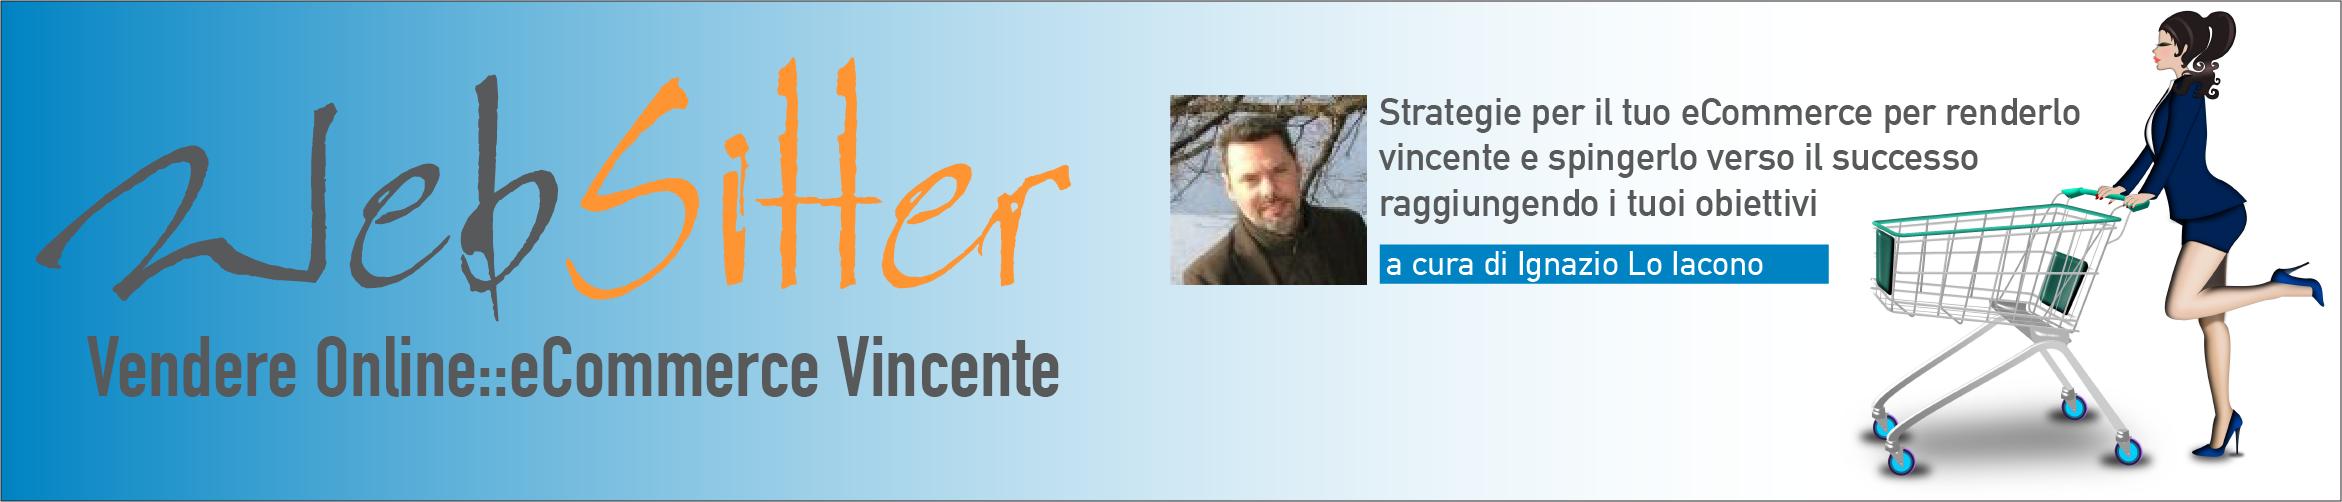 Websitter Srls::Vendere Online Professionalmente